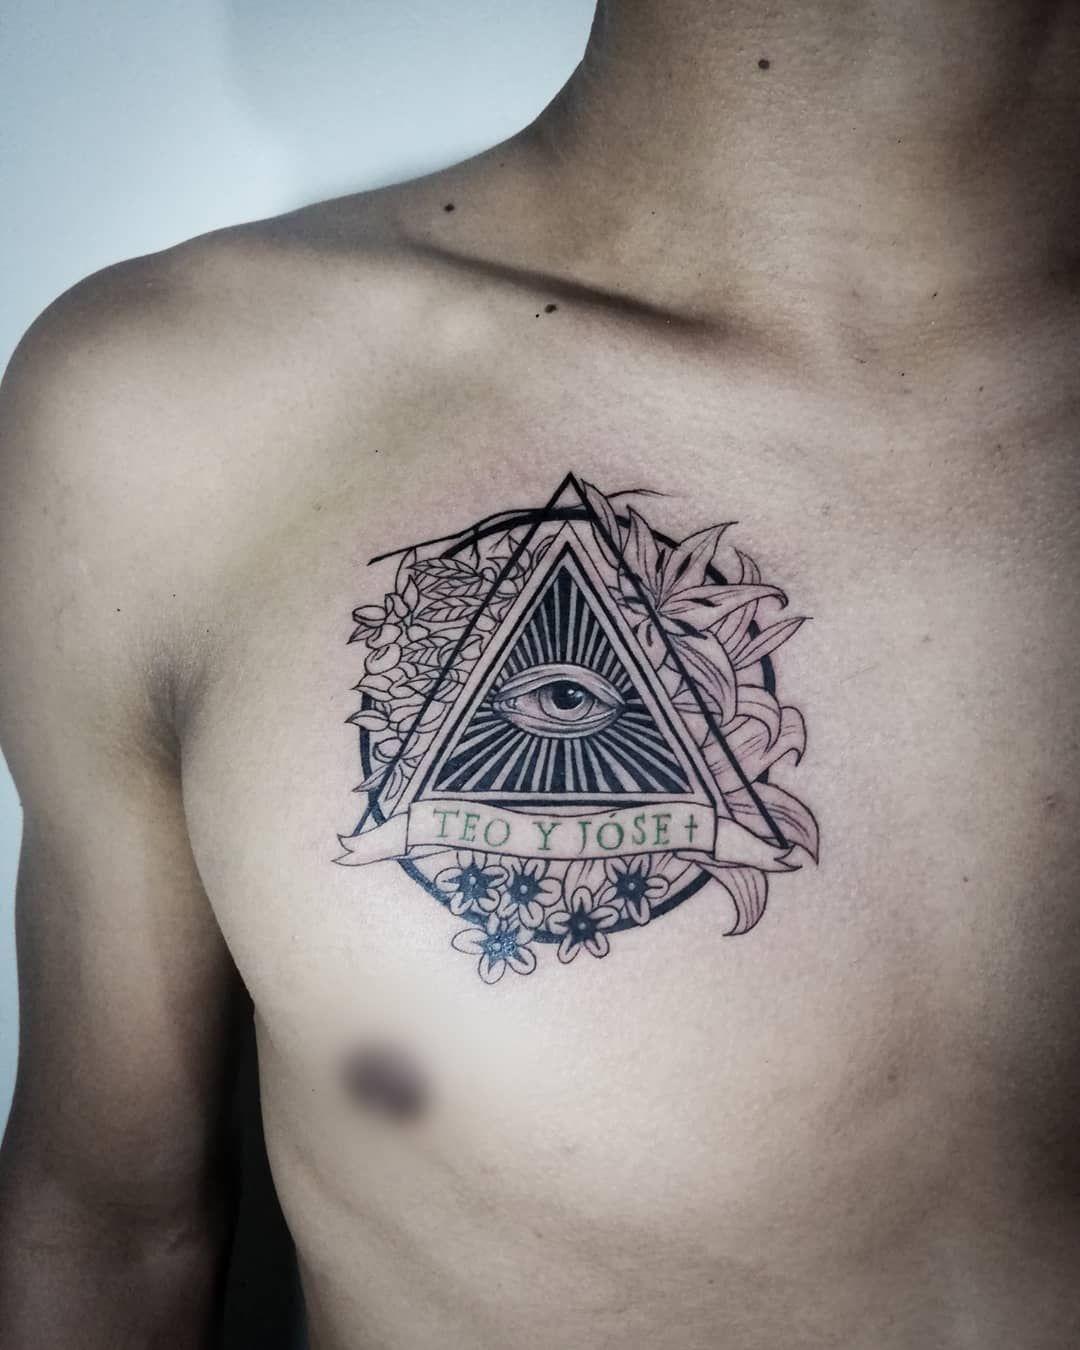 ❌Triángulo❌  Espero les guste ✌️💀 Para alguna consulta, presupuesto o separar una cita pueden dejarme un mensaje al inbox o al WhatsApp 955835575 📲 (No llamadas) × × × × ×  #tattooart #koitattoo #happytattoo #perutattoo #peruart #peruvianart #peruvianartist #ink #tattoo #tarapoto  #eternalink #letteringtattoo #orientaltattoo #wordingtattodesign #tatuajes #tattooartwork #linework #blackworktattoo #biotattoo #biomecanico #mechanictattoo #blacktattooworlds #blackandwhite  #blackandgrey #blackangr